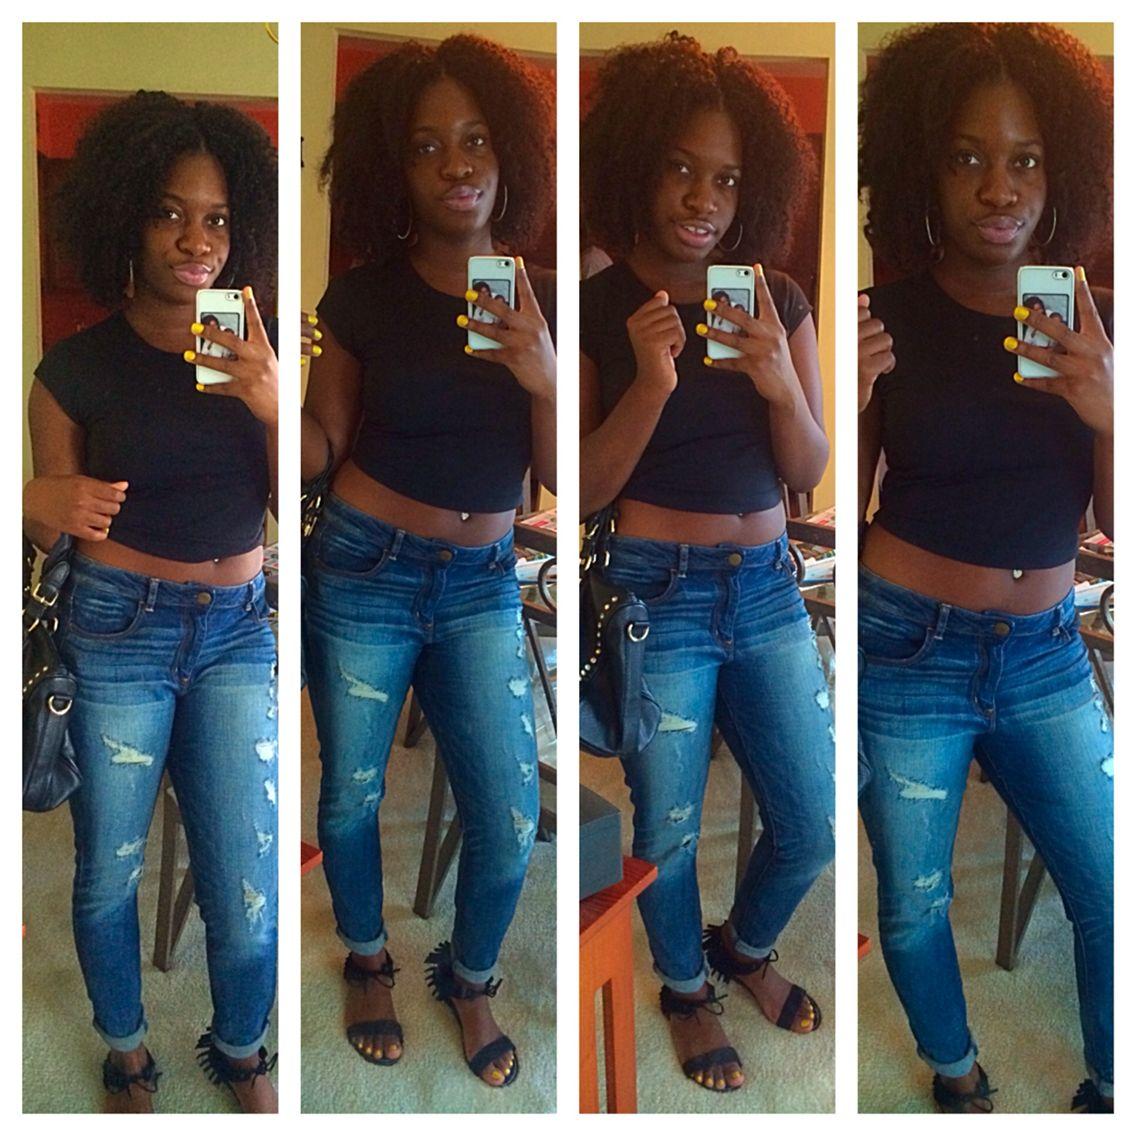 Boyfriend Jeans Black Crop Top Ripped Jeans Black Outfit Curly Hair Natural Hair Dark Skin Girls Capri Pants Outfits Pants